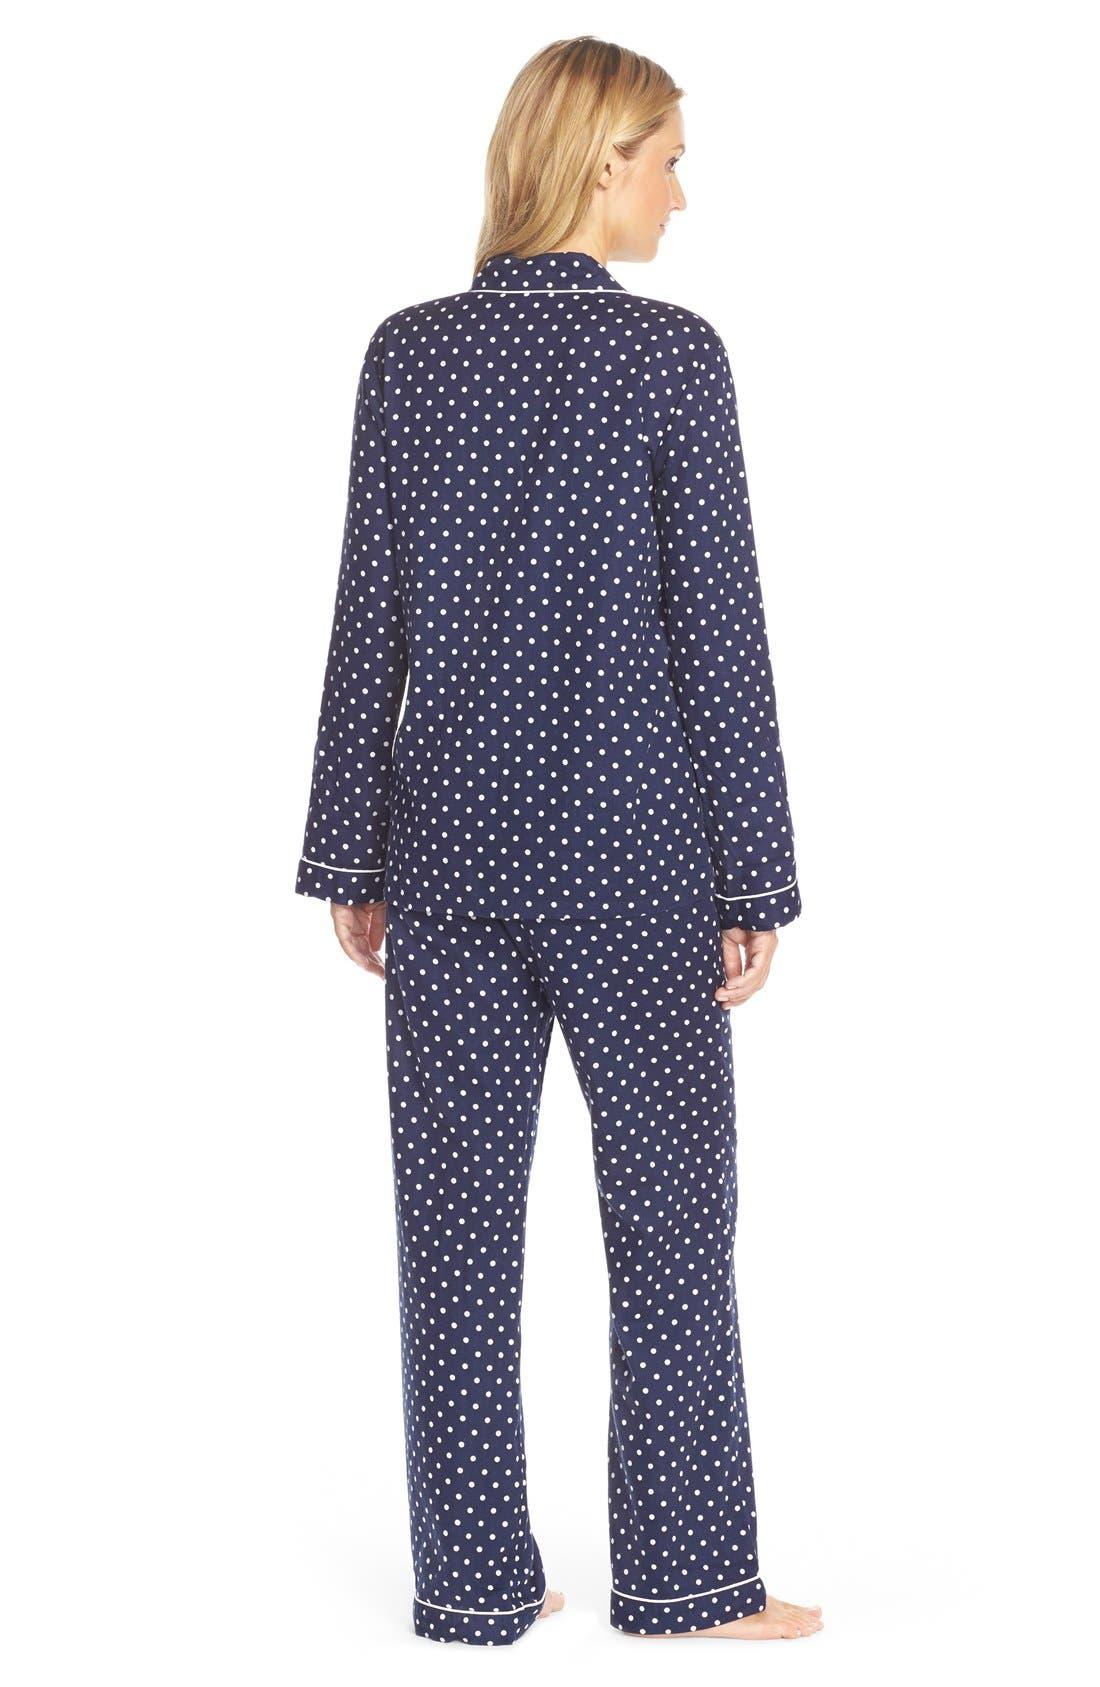 Cotton Twill Pajamas,                             Alternate thumbnail 15, color,